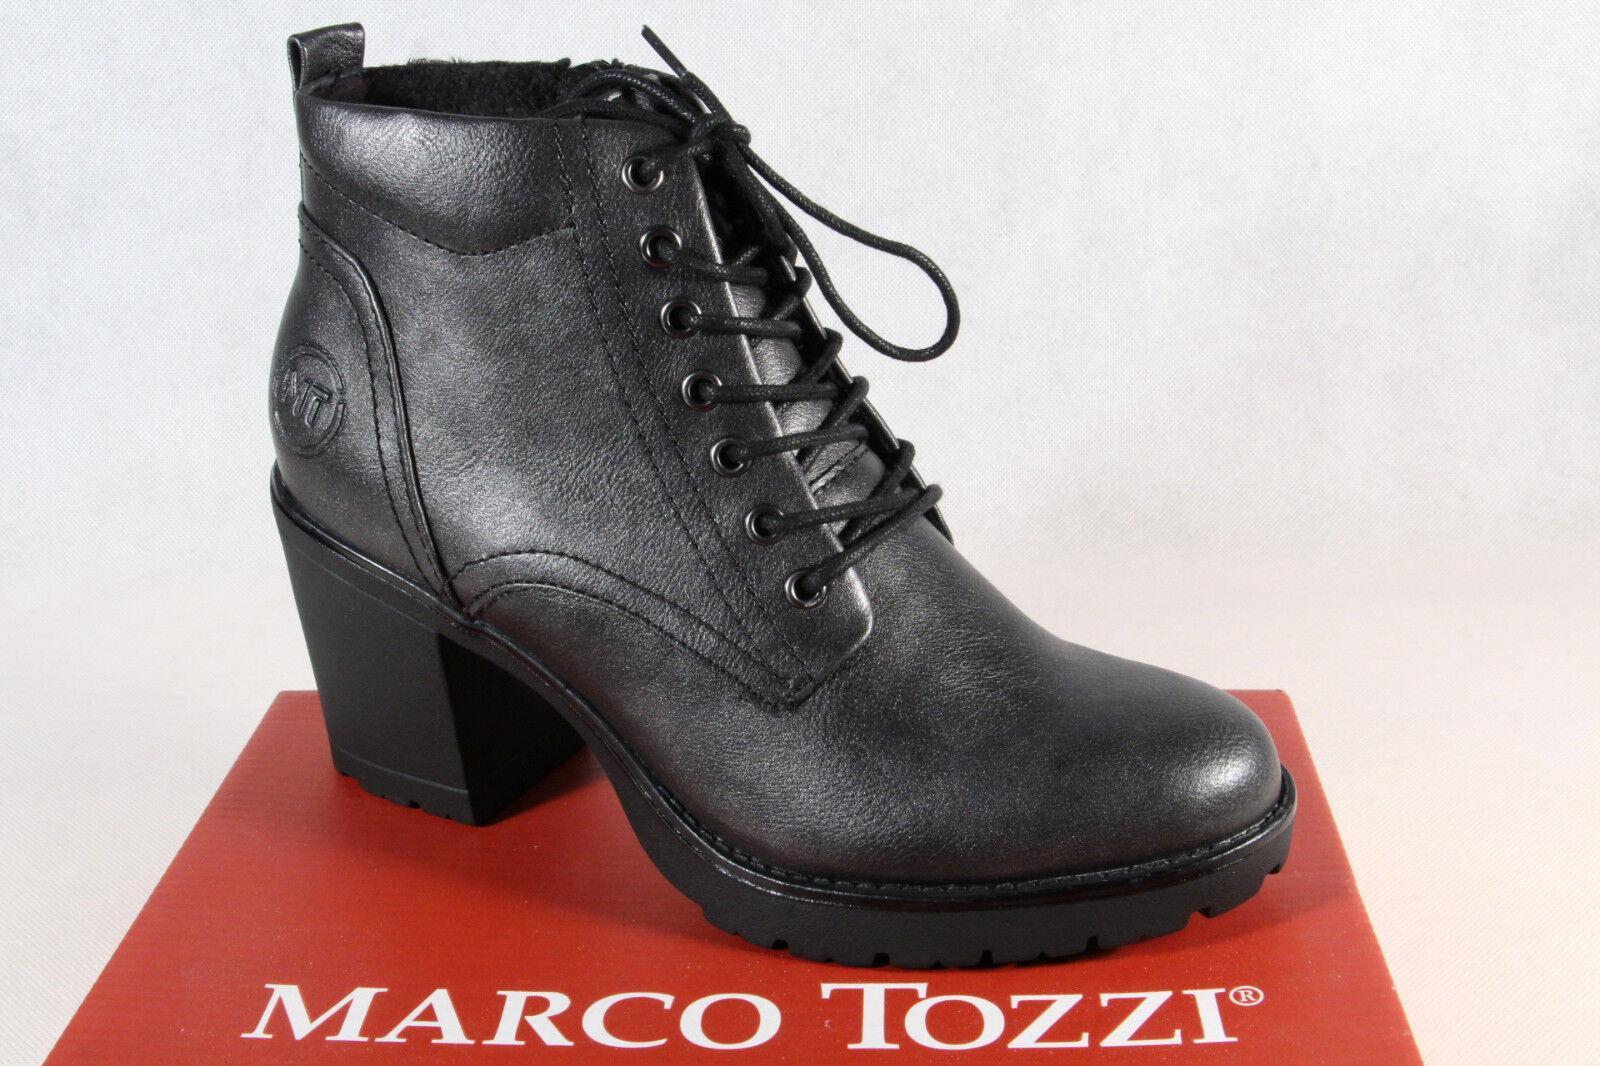 new arrival c2ea6 11c3b Marco Tozzi Stiefel Stiefelette Boots Winterstiefel grau 25204 NEU!!